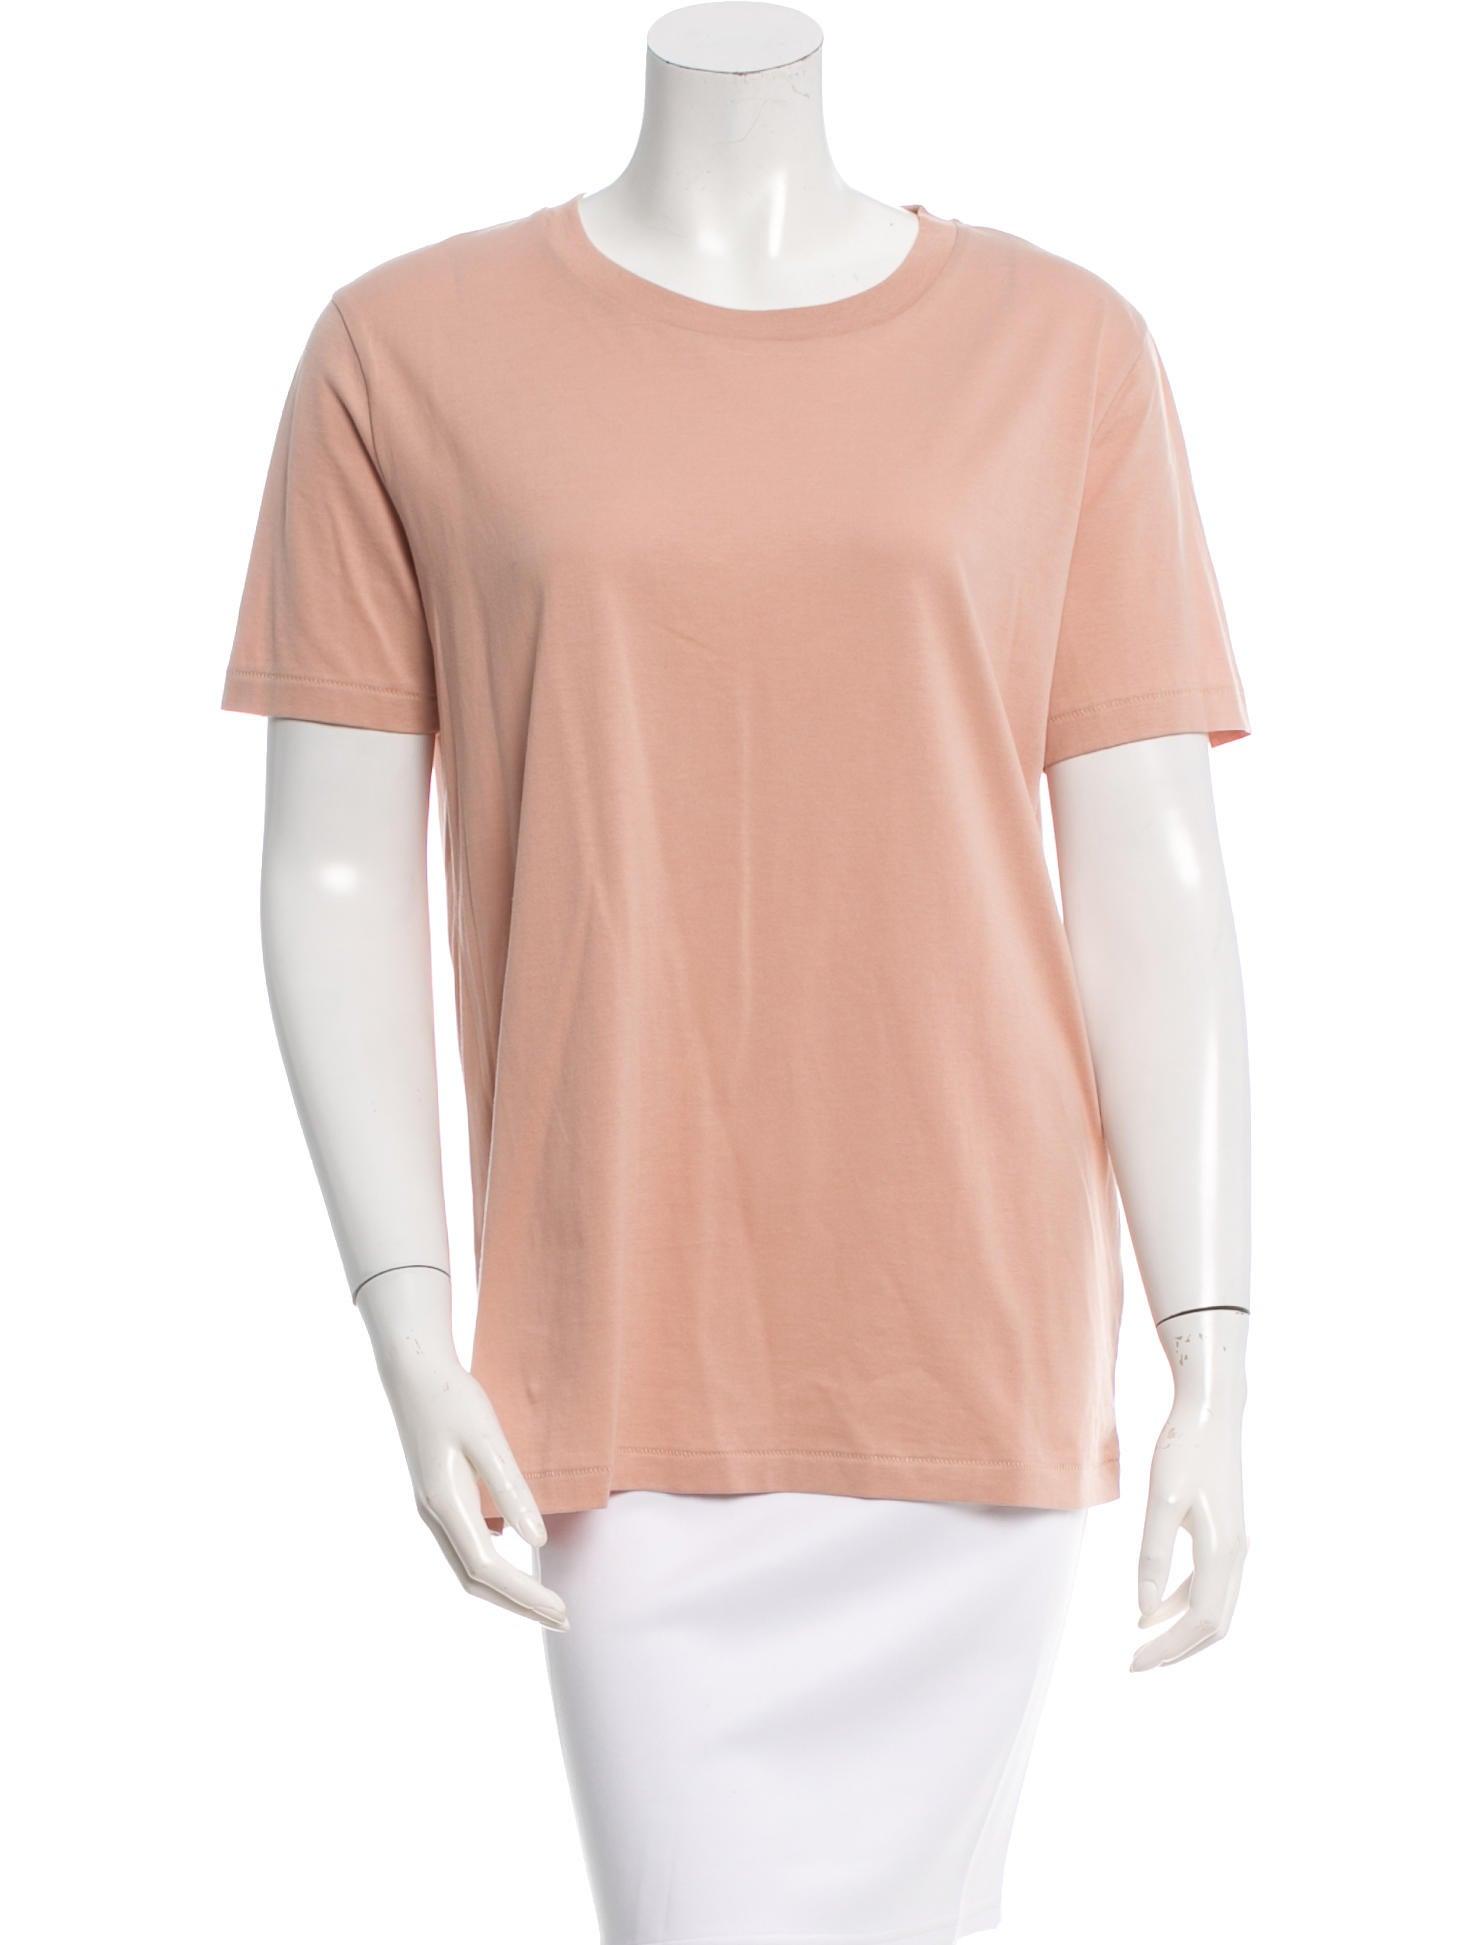 Acne Short Sleeve Scoop Neck T Shirt Clothing Acn26381